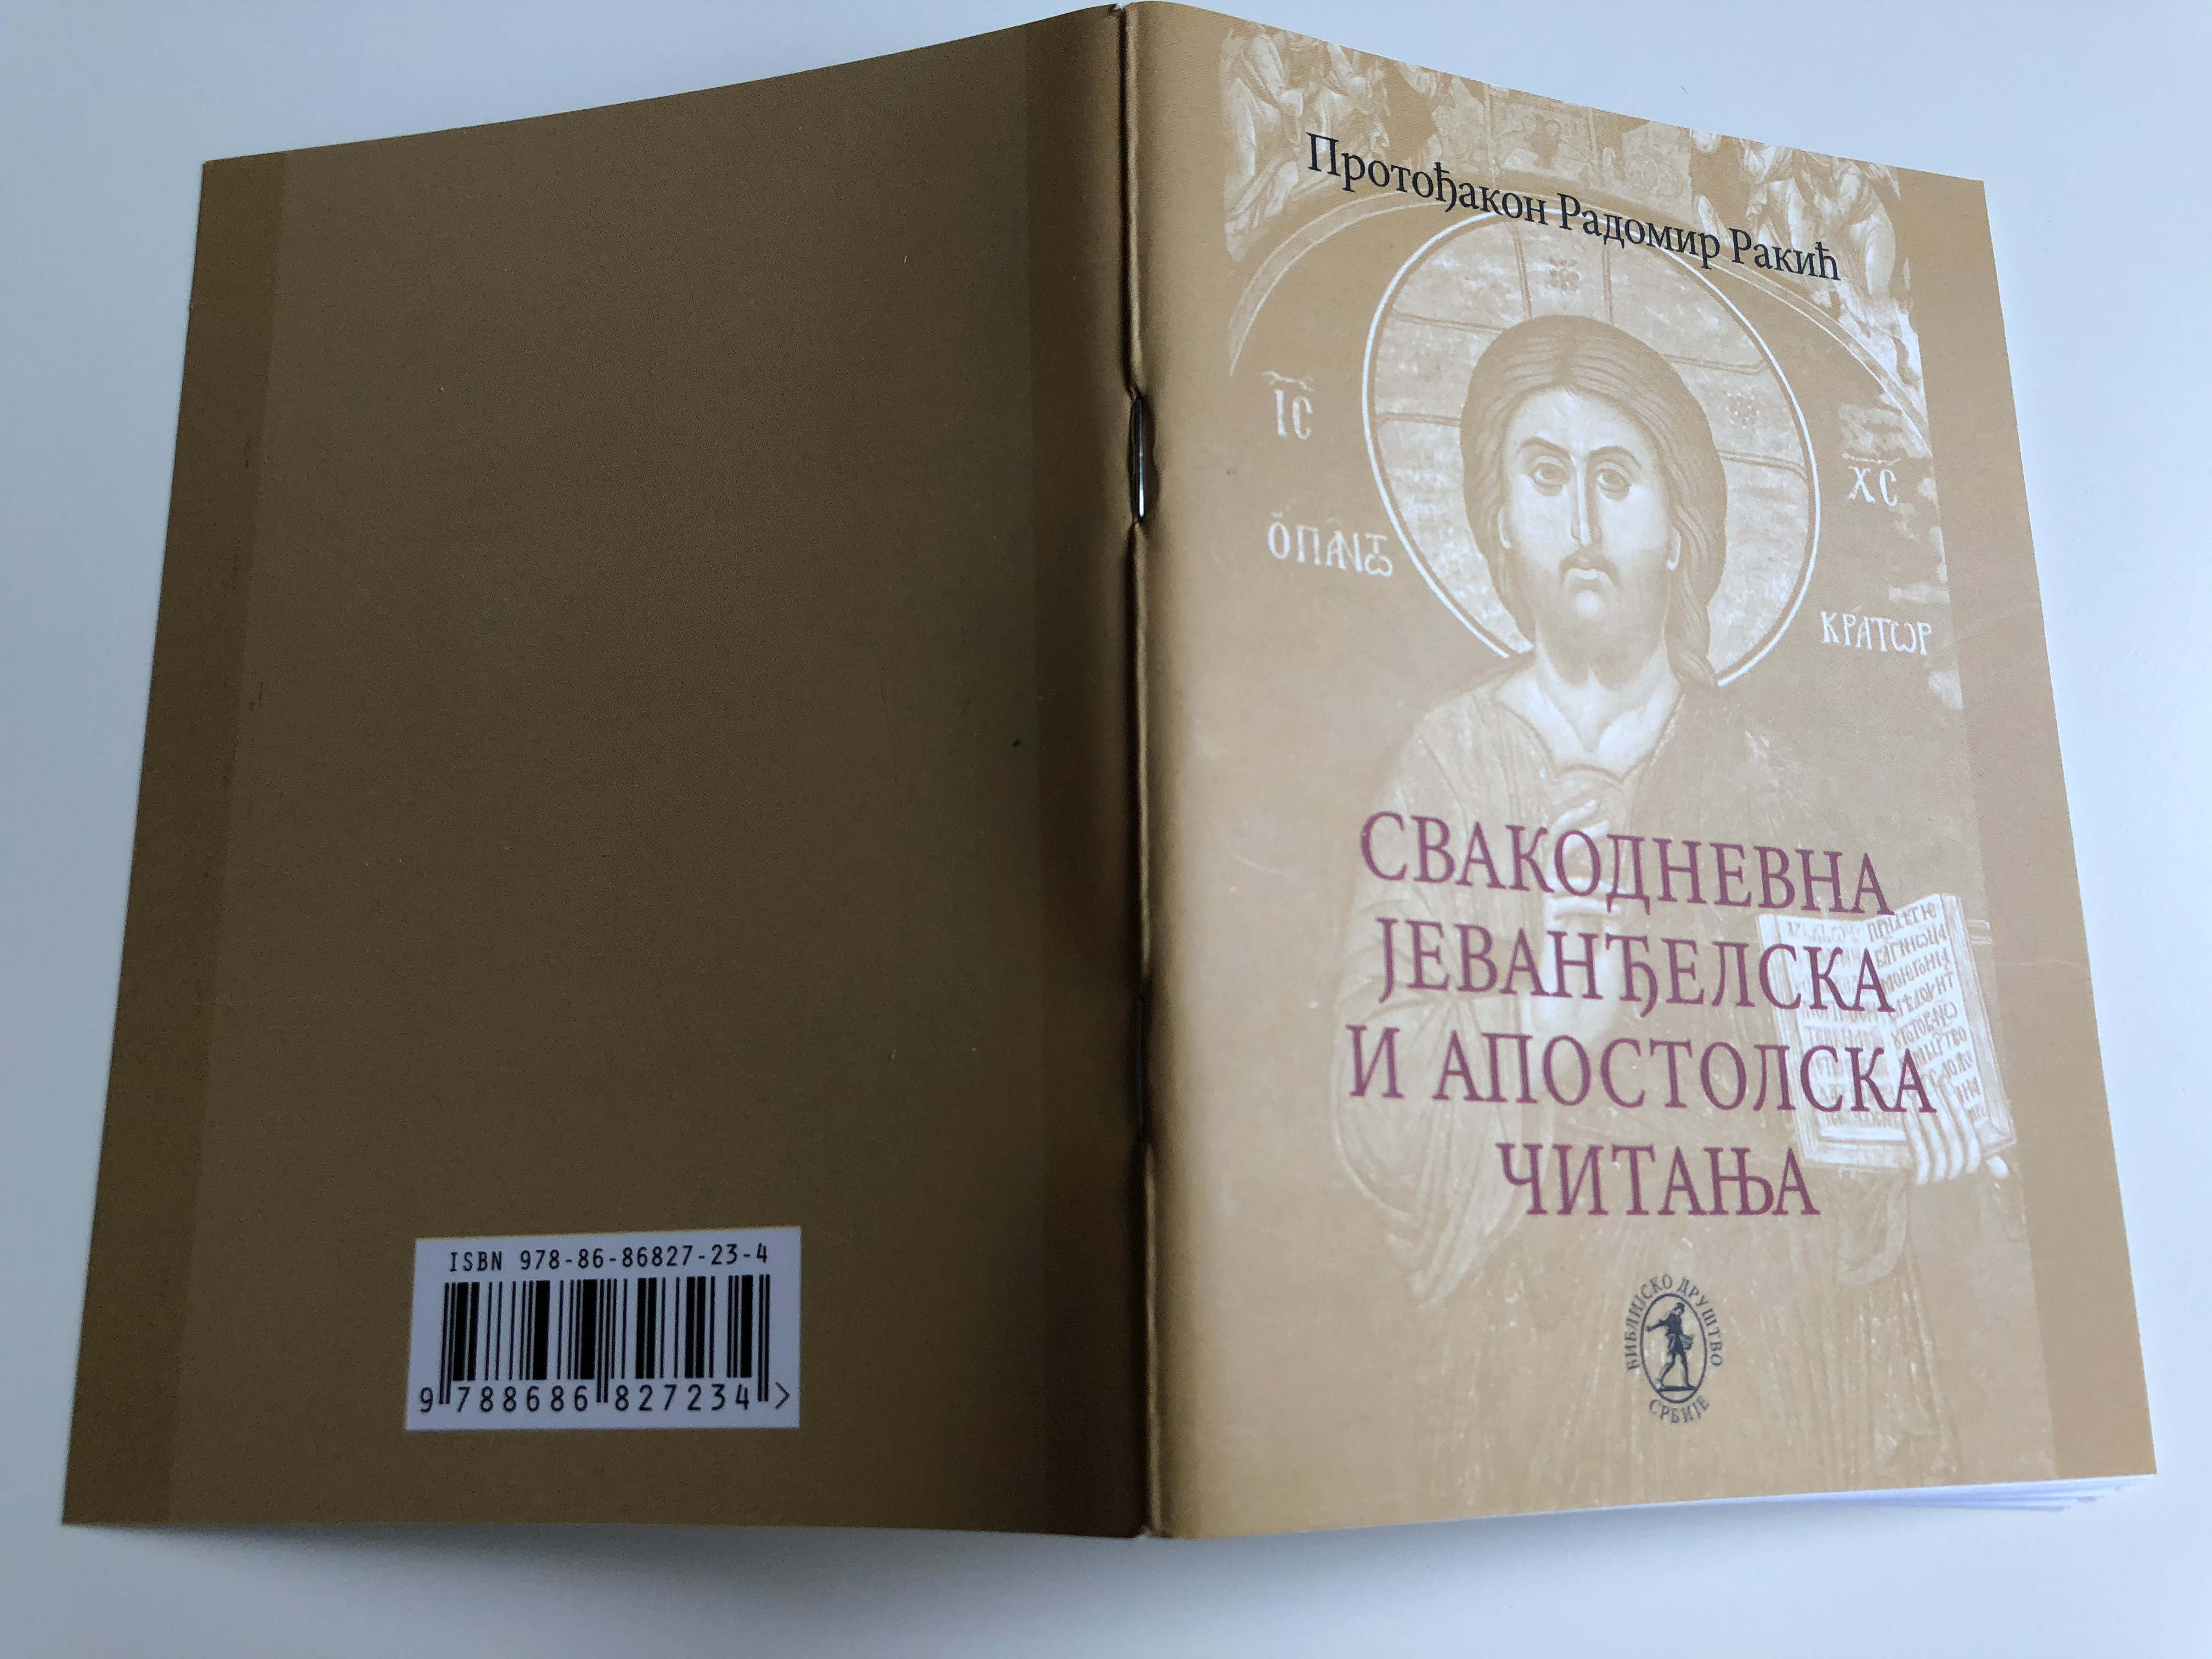 svakodnevna-jevan-elska-i-apostolska-itanja-by-proto-akon-radomir-raki-13.jpg